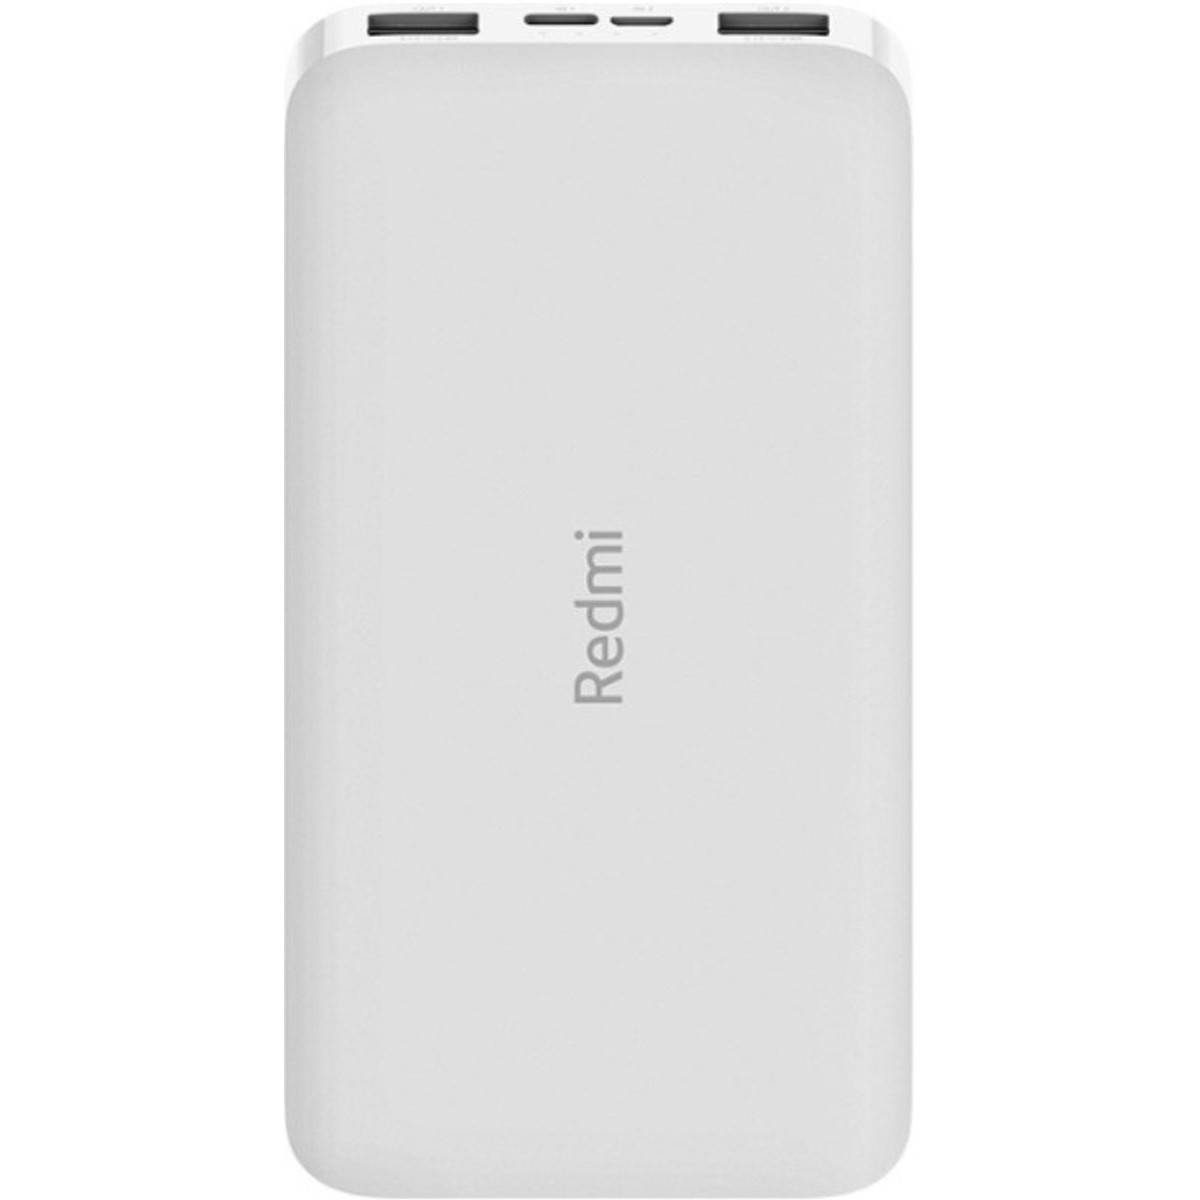 Портативное зарядное устройство Xiaomi Redmi Power Bank 10000mAh (VXN4286)